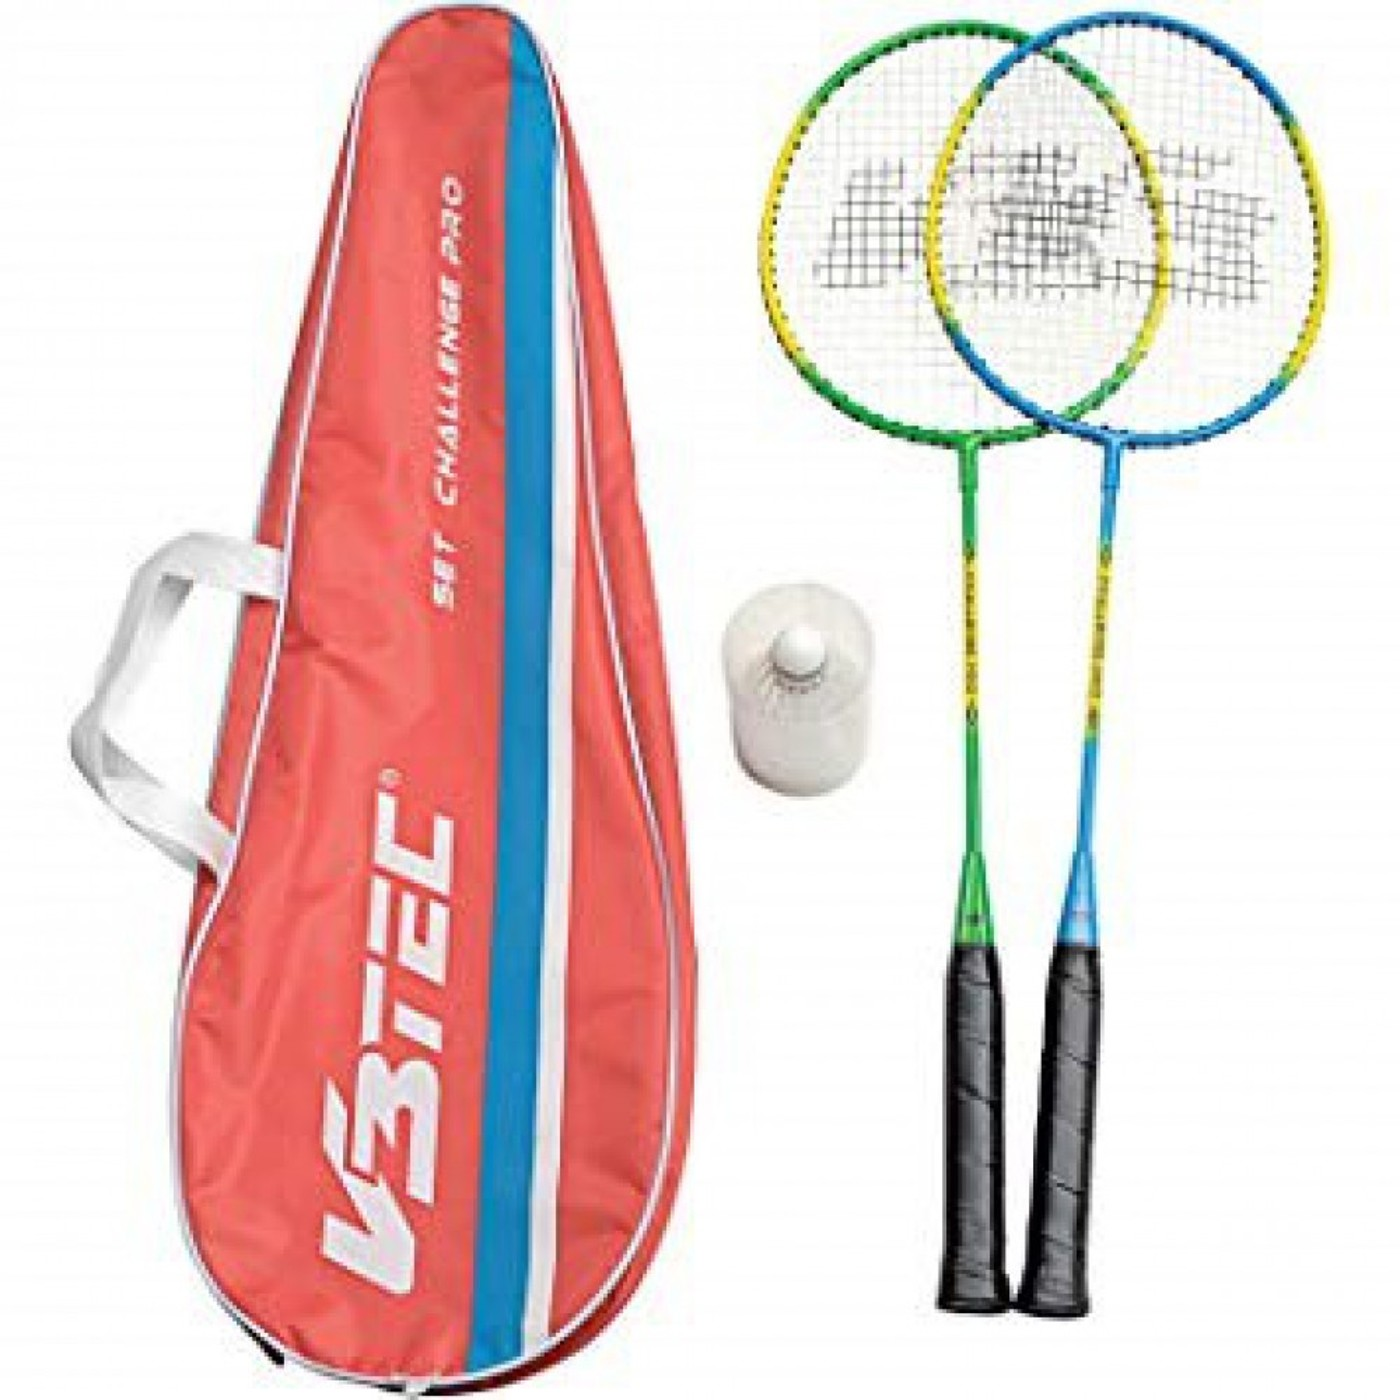 V3TEC Badmintonset CHALLENGE PRO